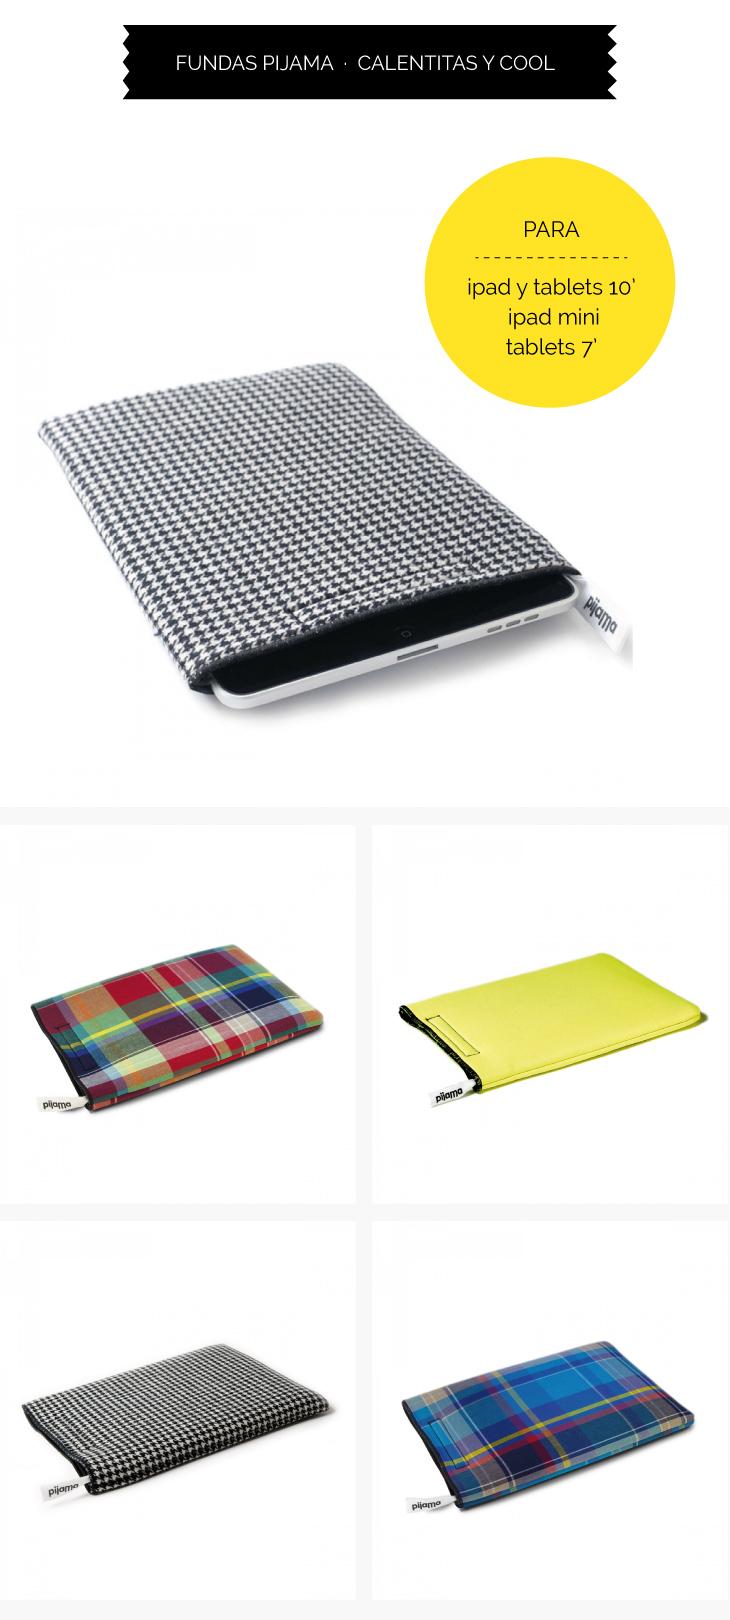 Fundas para Ipad Pijama, ipad mini y tablets de siete pulgadas